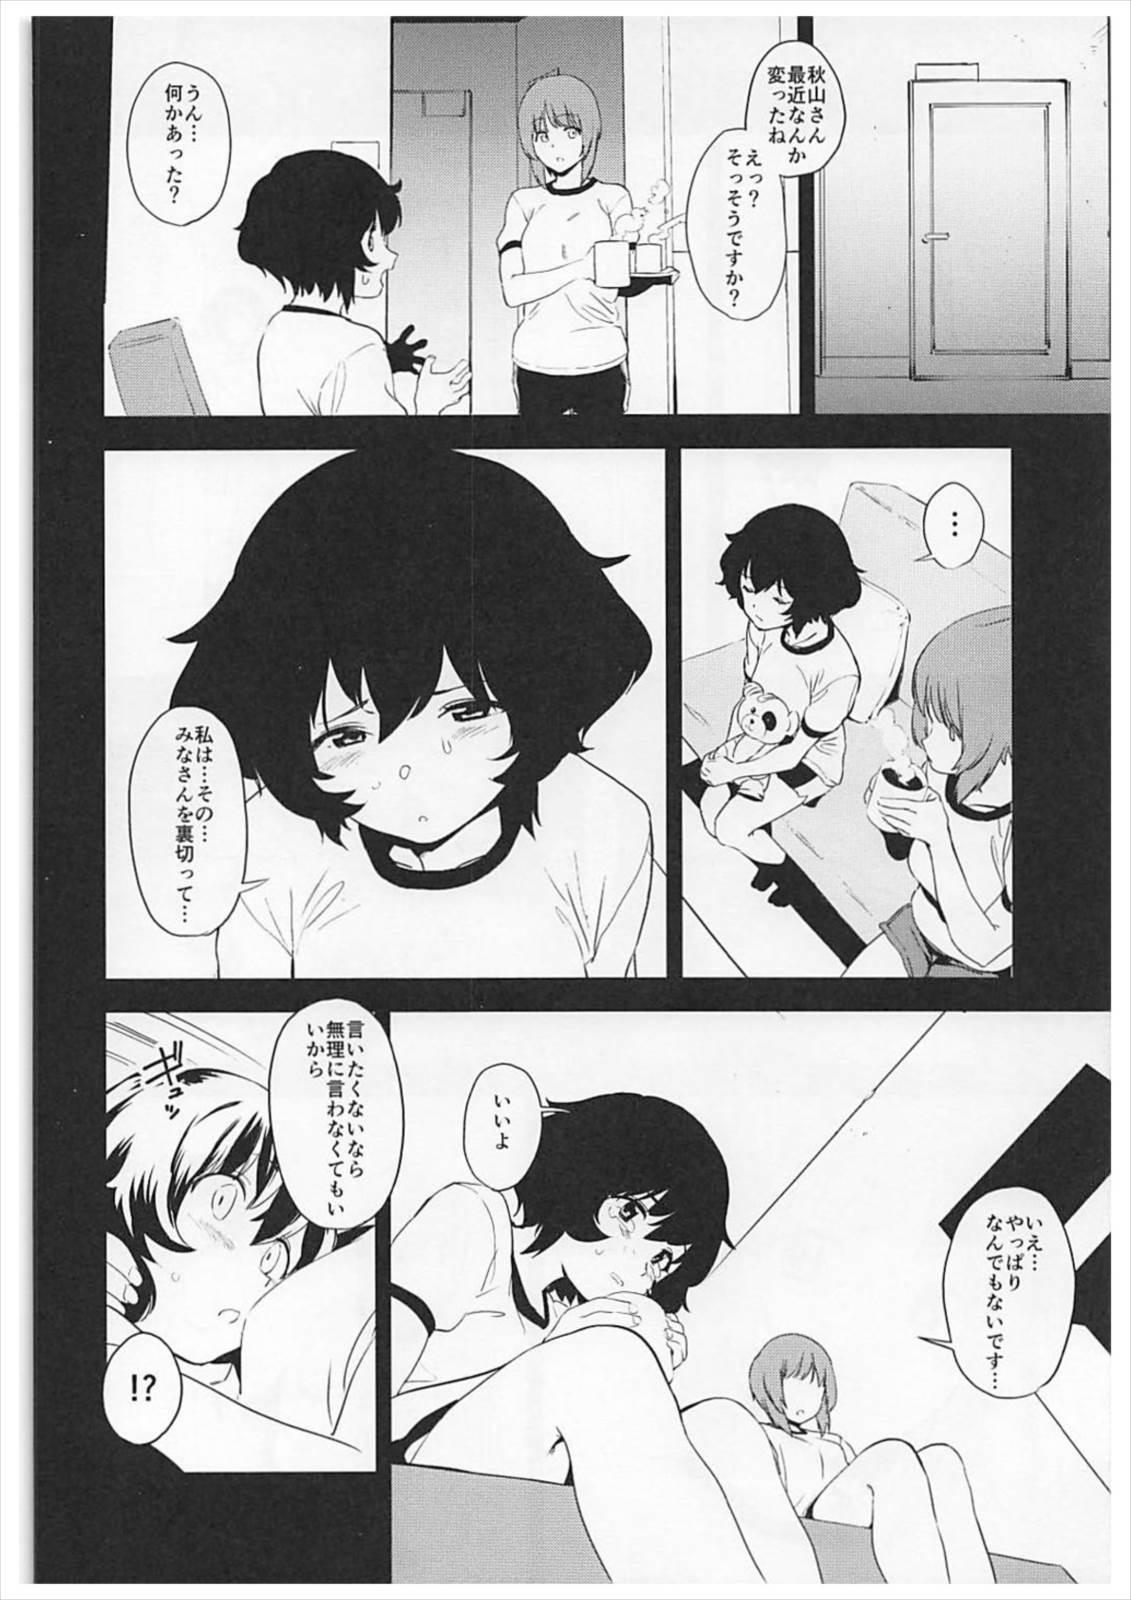 (Panzer Vor! 13) [Camrism (Kito Sakeru)] Private Akiyama 2 - Nishizumi-san to Issho (Girls und Panzer) 6